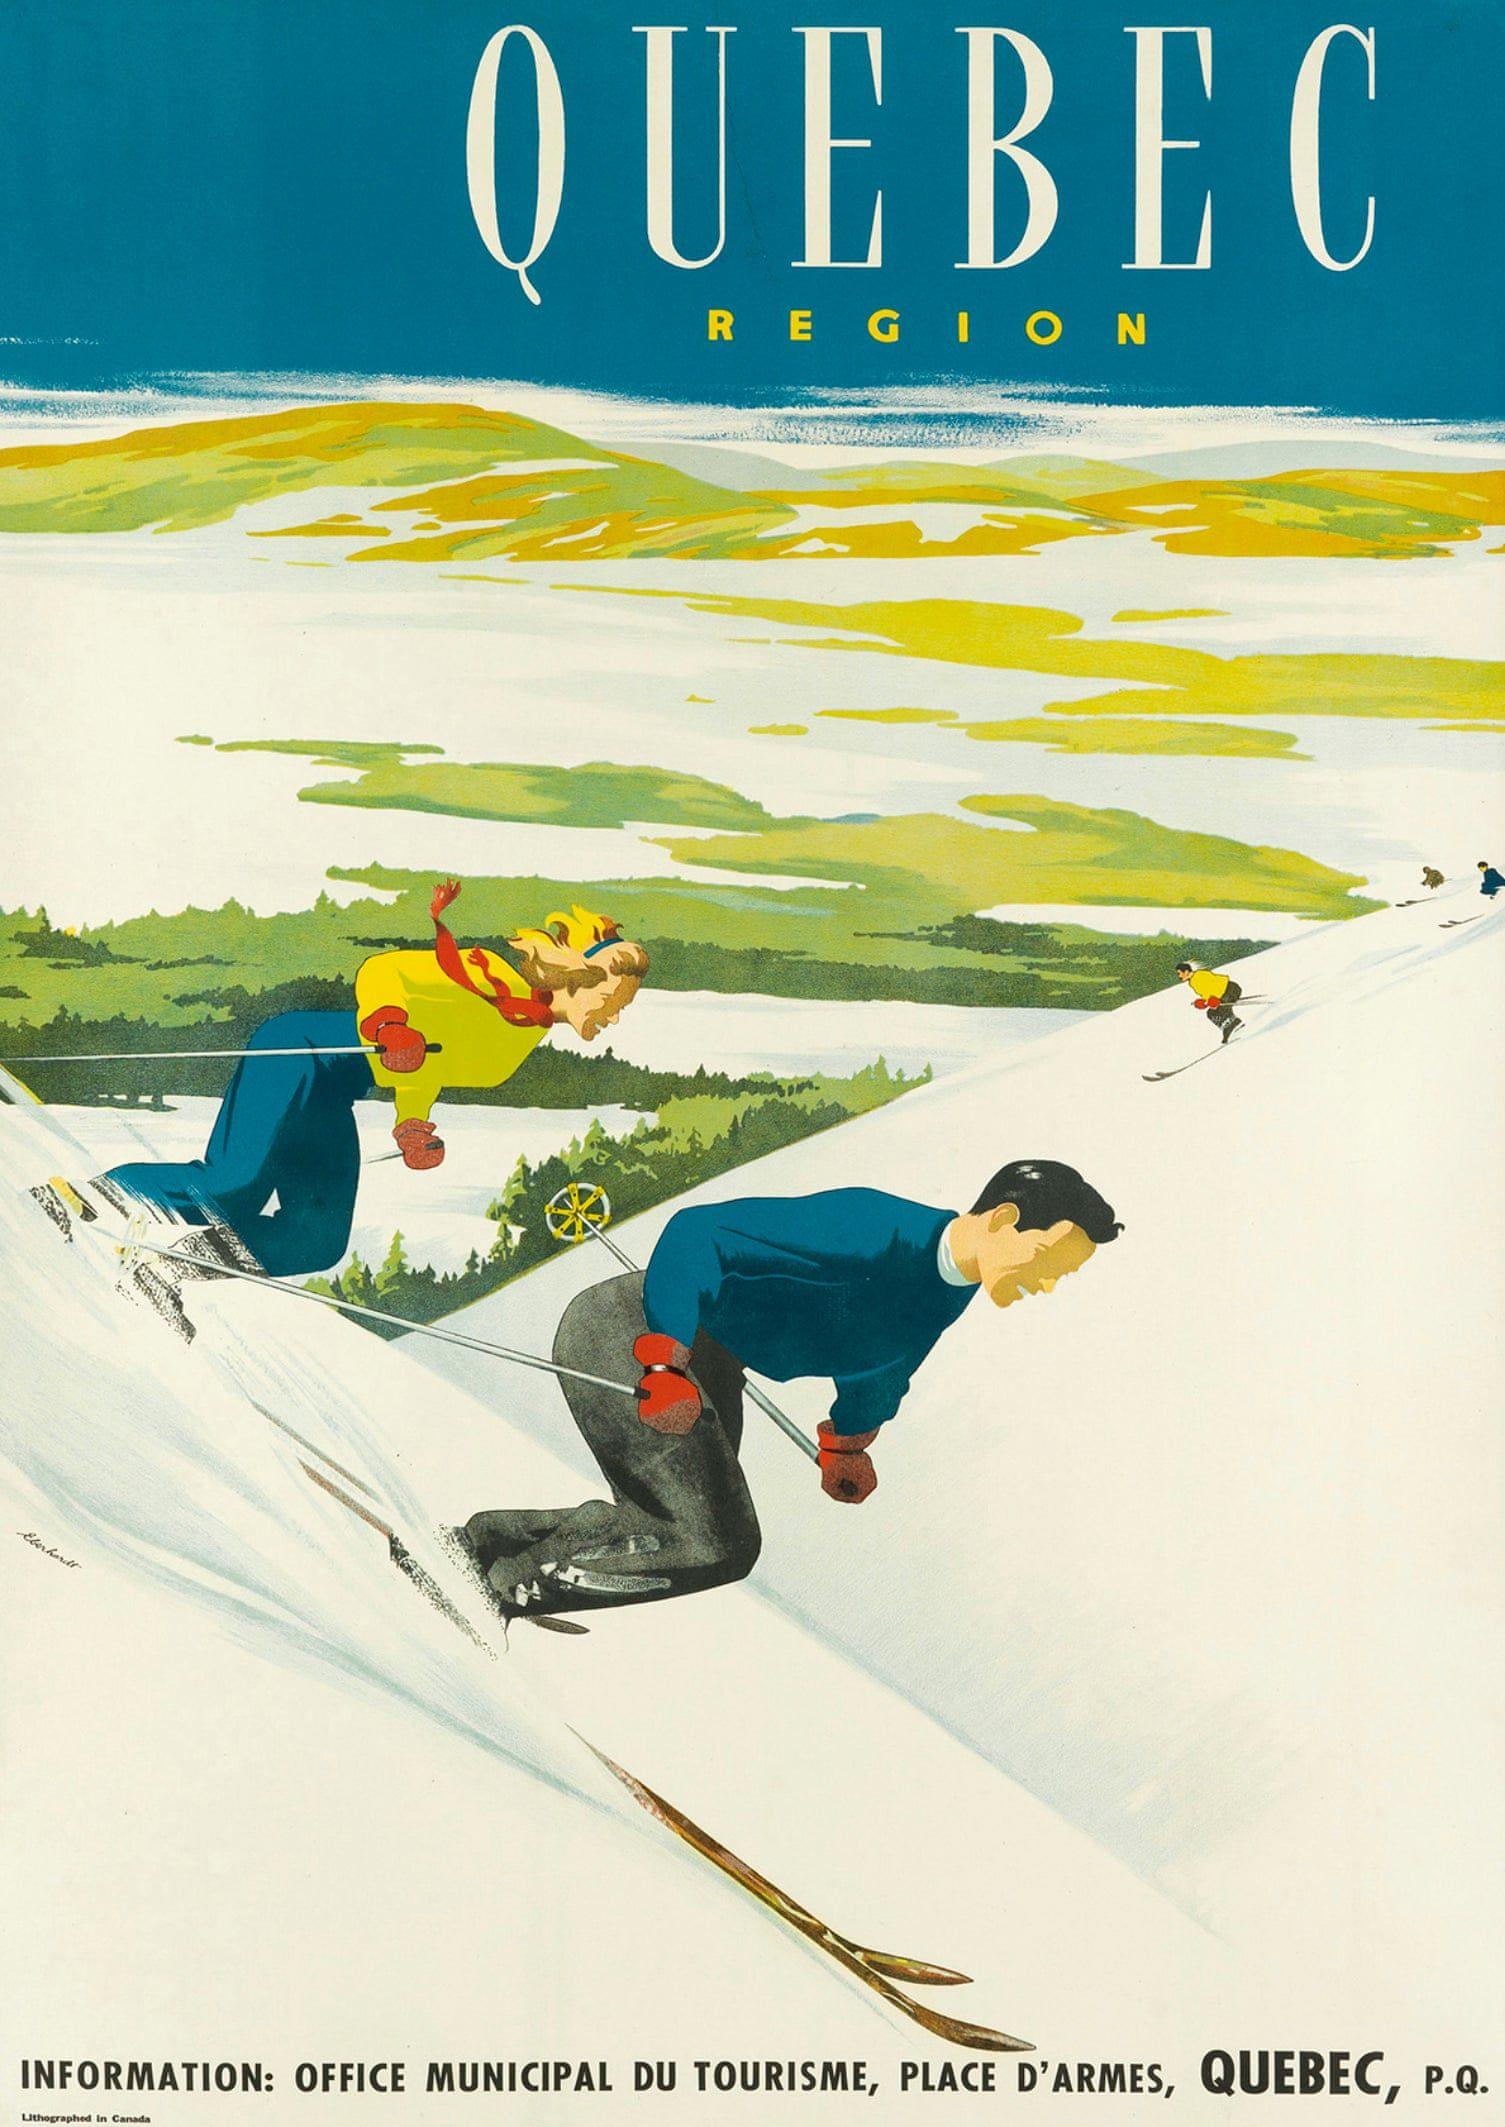 GIRL DOWNHILL SKIING SKI FUN DAVOS SWITZERLAND WINTER SPORT VINTAGE POSTER REPRO